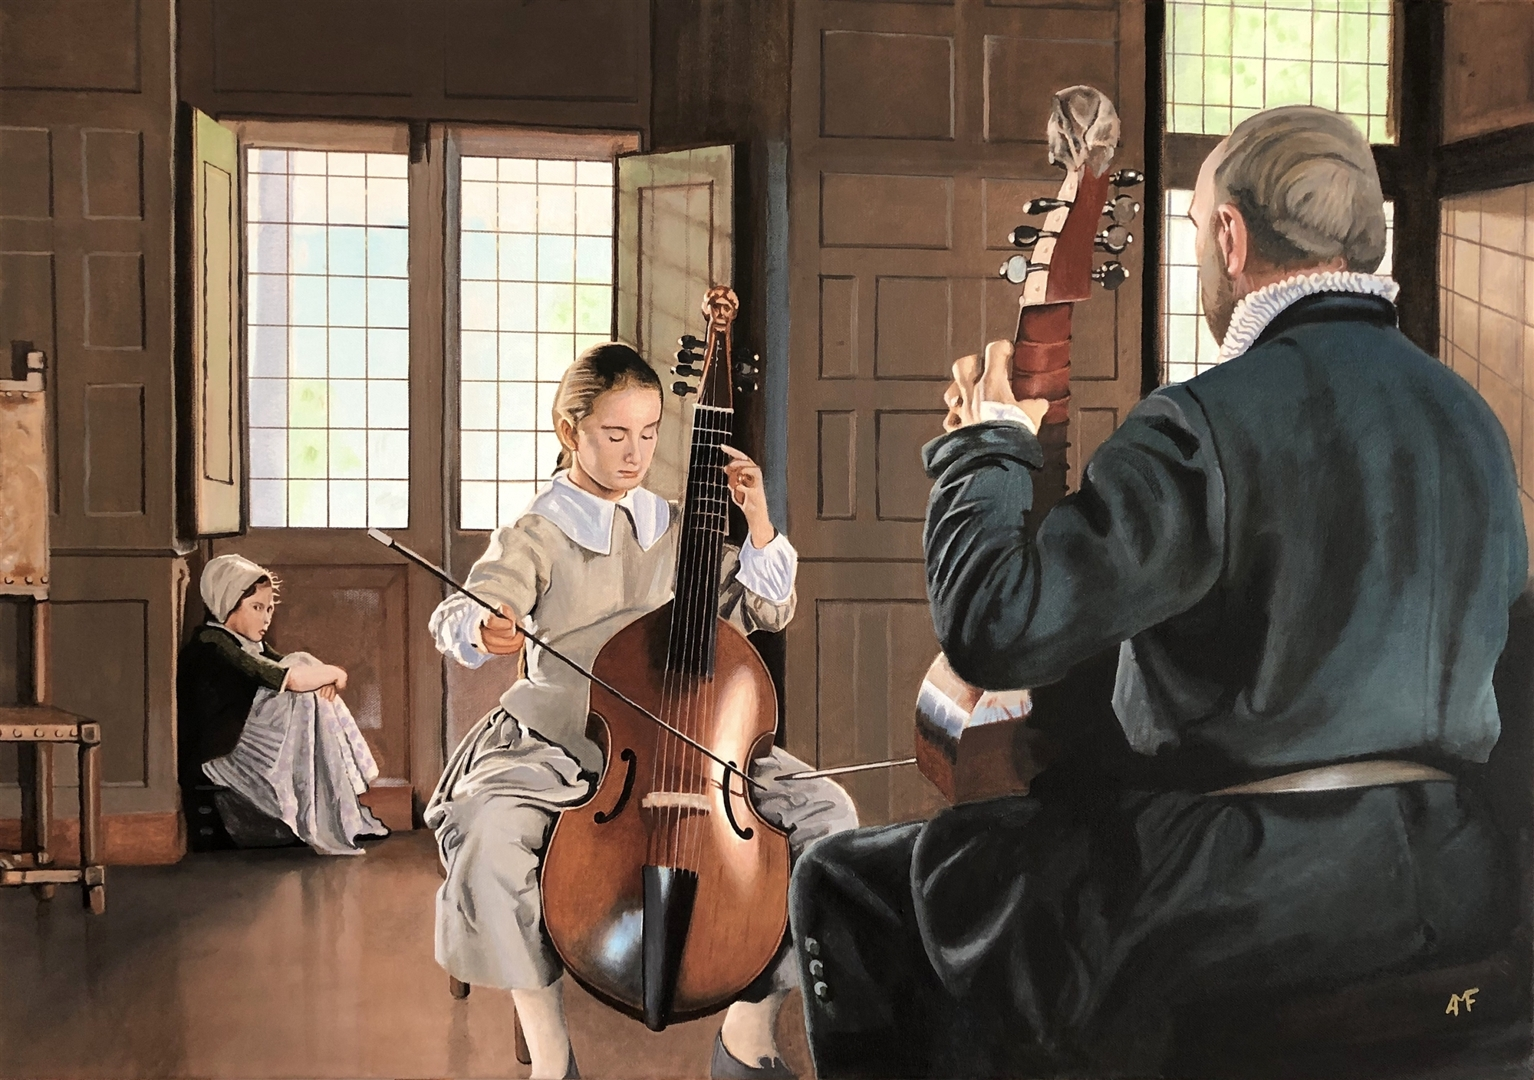 Arnaud Feuga, Lesson of Viola da Gamba, Oil on Linen, 26 x 36 image